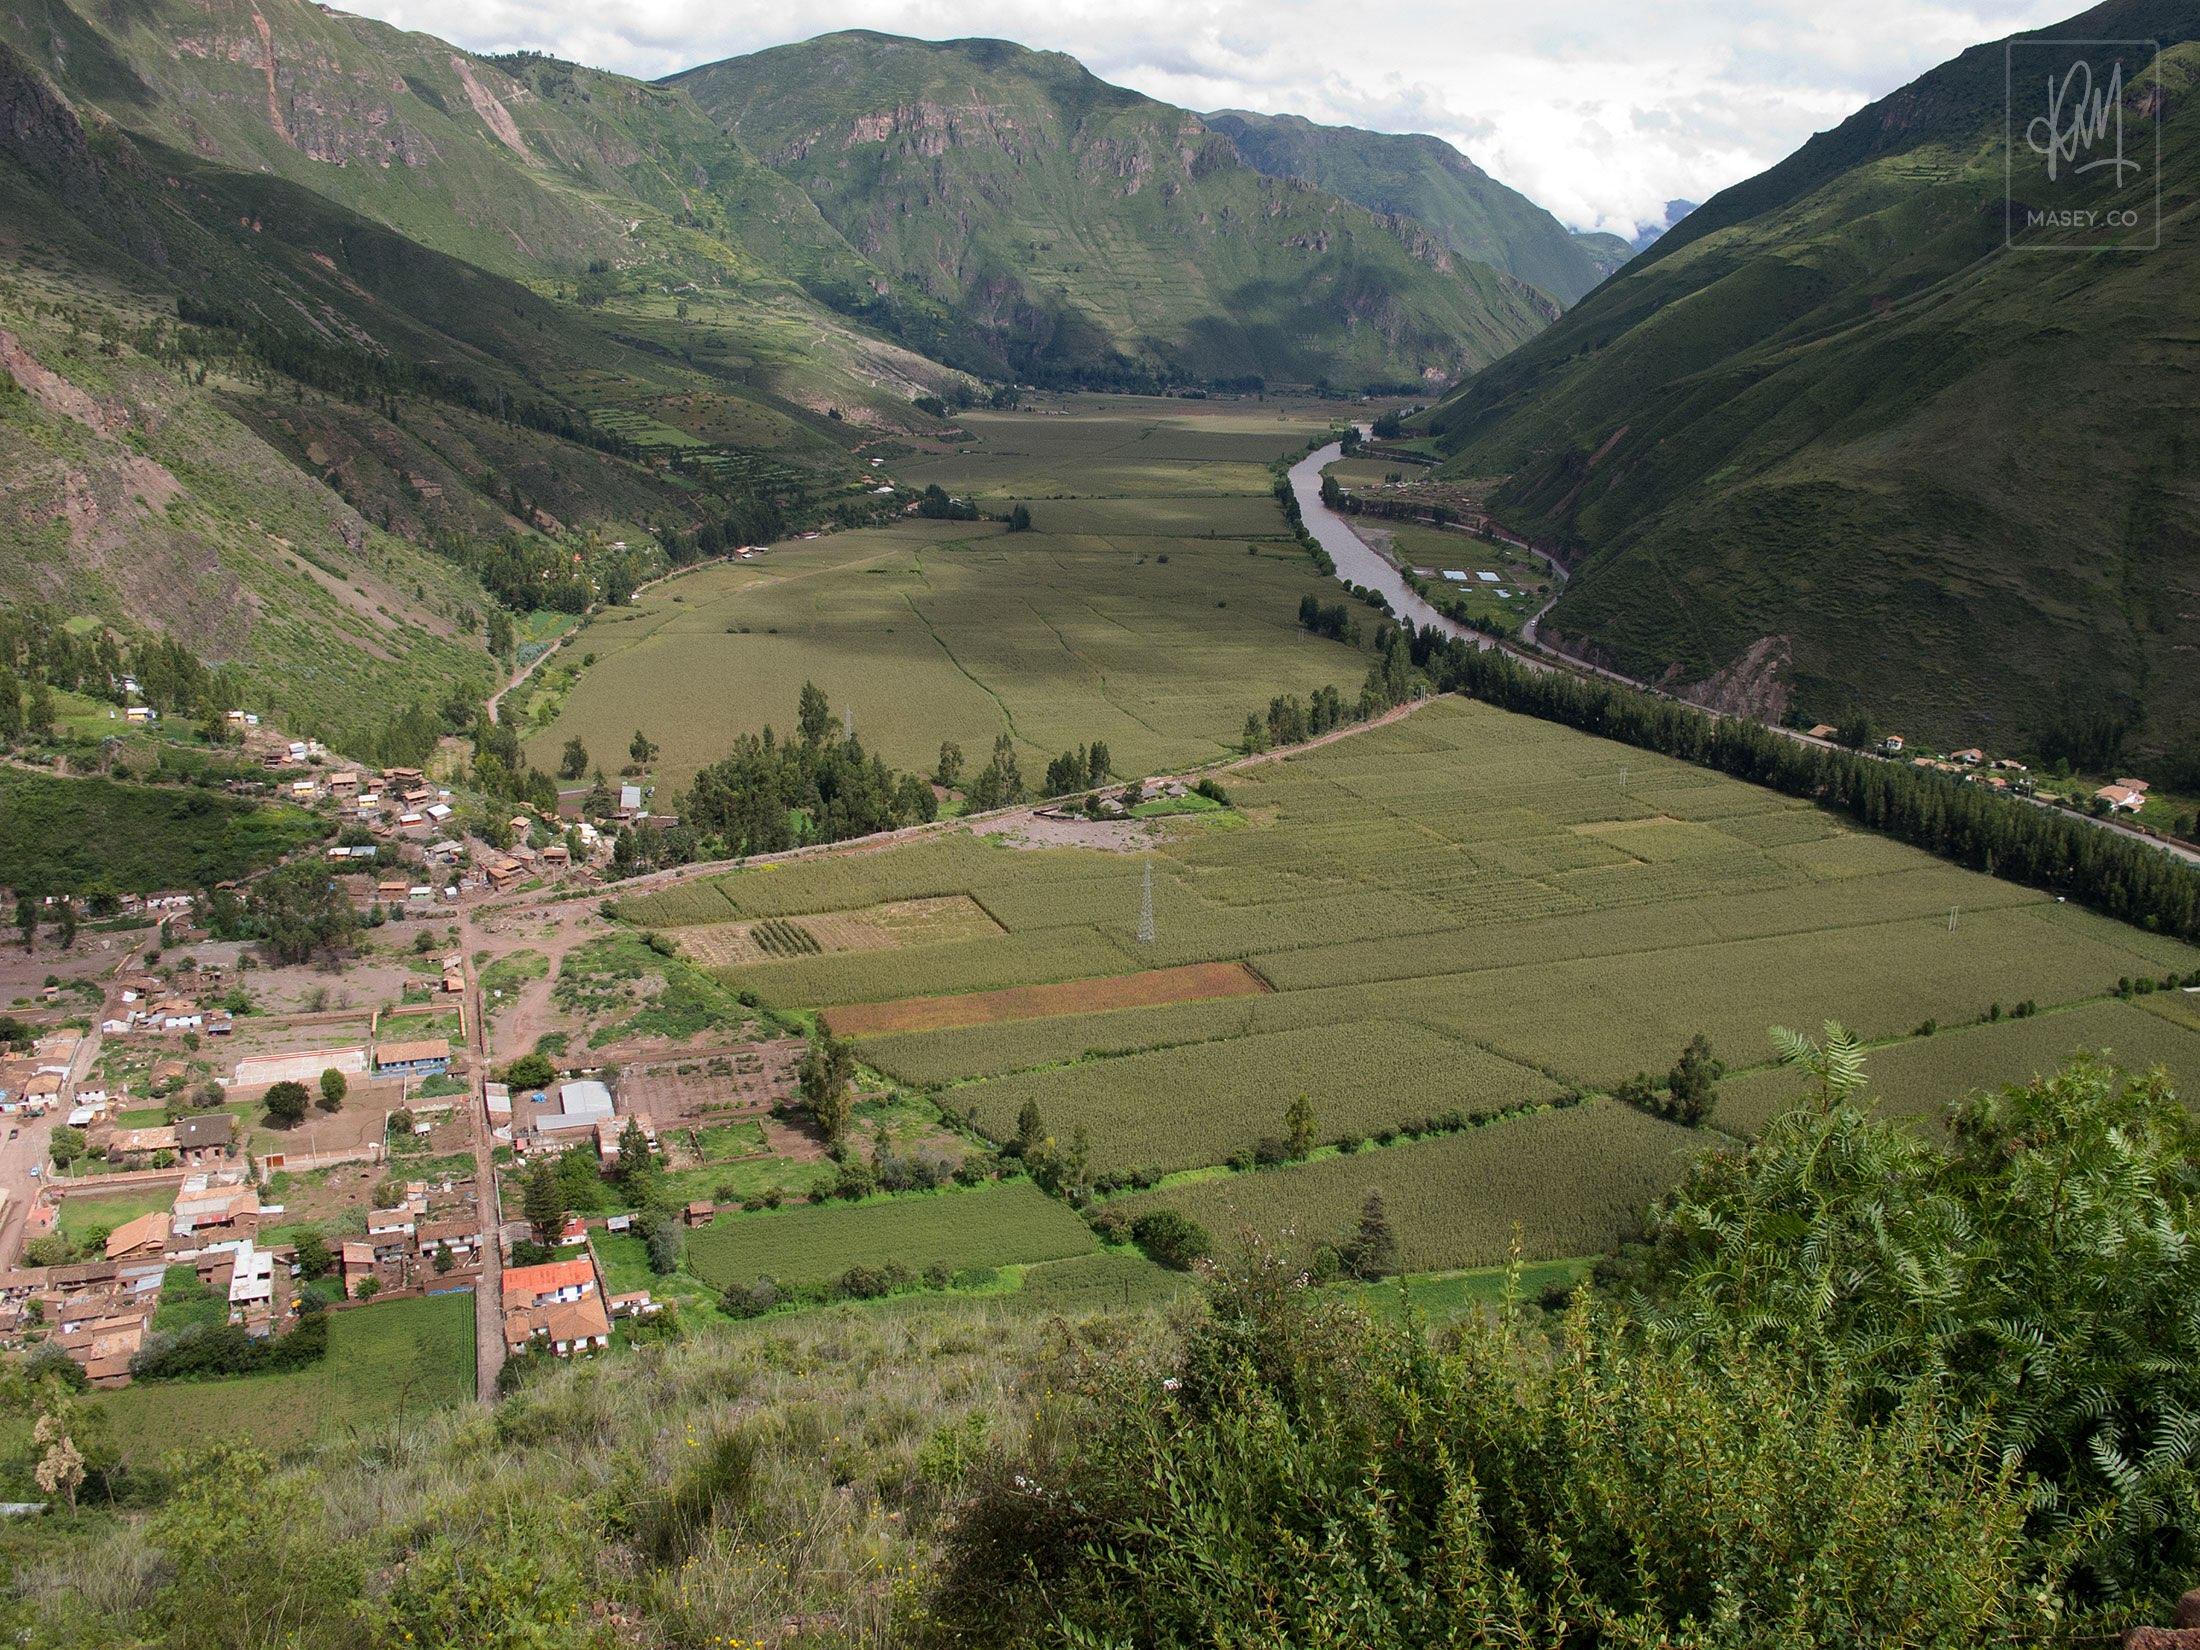 G Adventures South America: Day 9 - Ollantaytambo